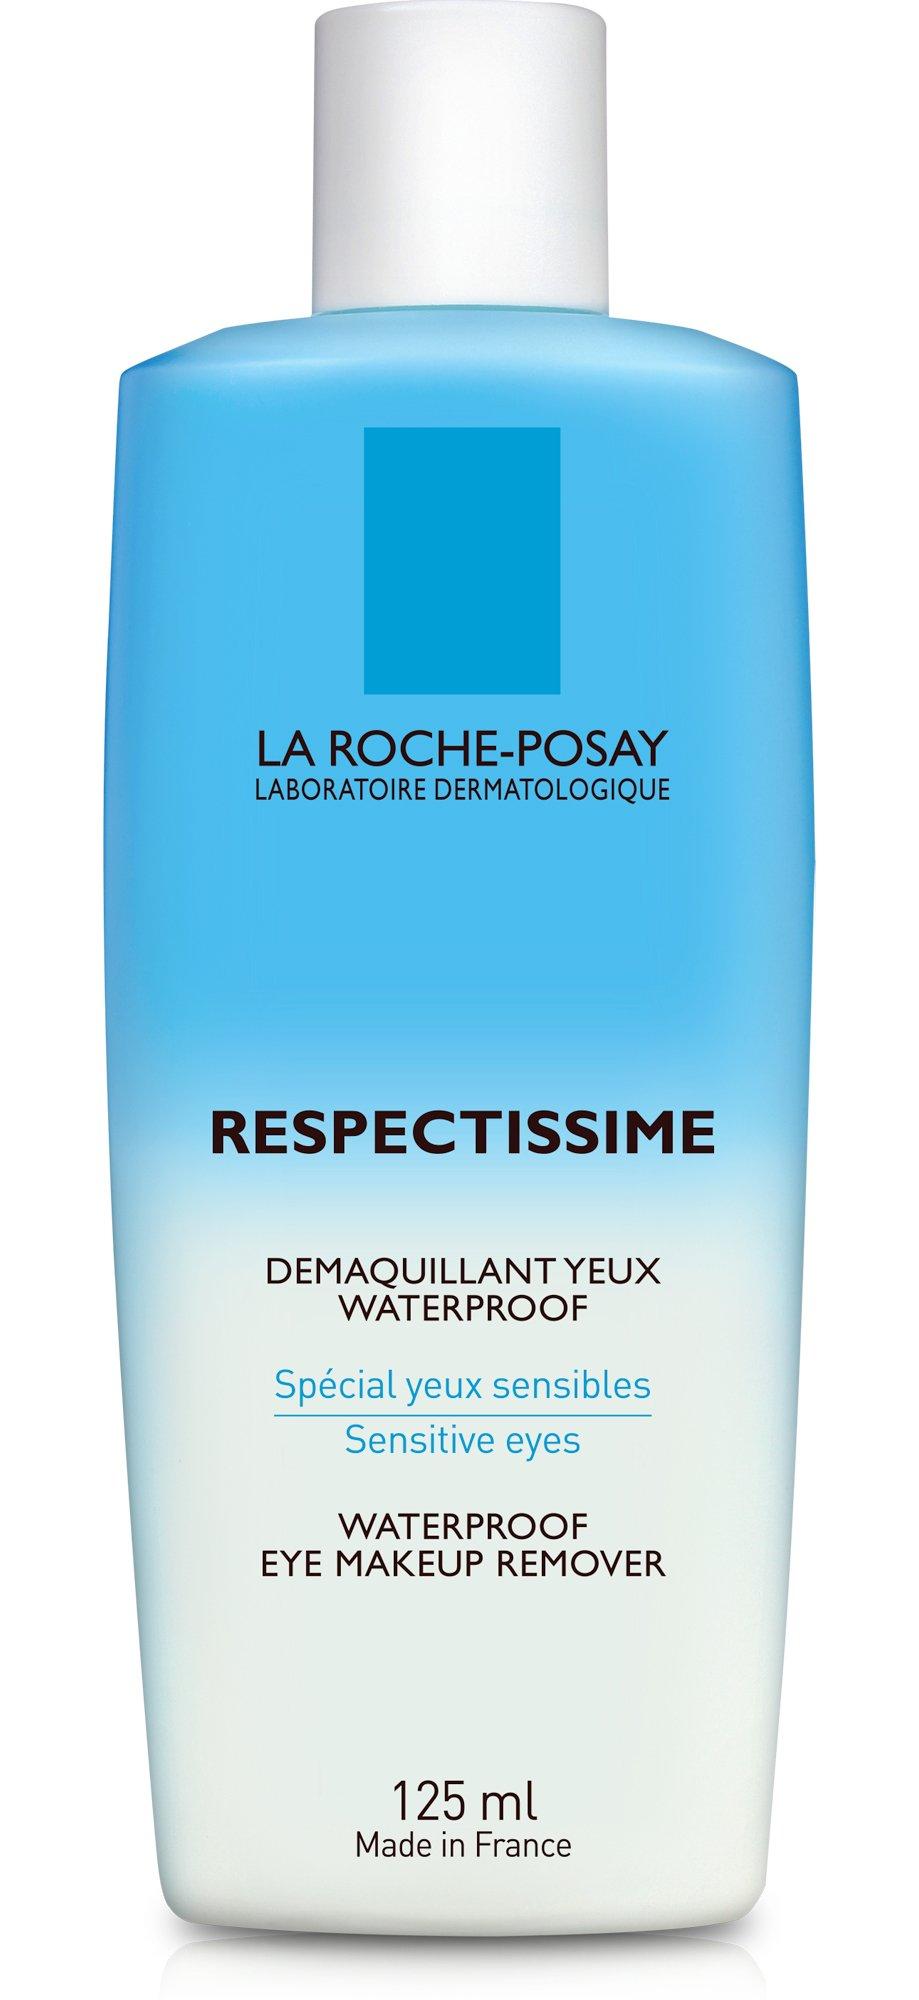 La Roche-Posay Respectissime Waterproof Eye Makeup Remover, 4.2 Fl. Oz. by La Roche-Posay